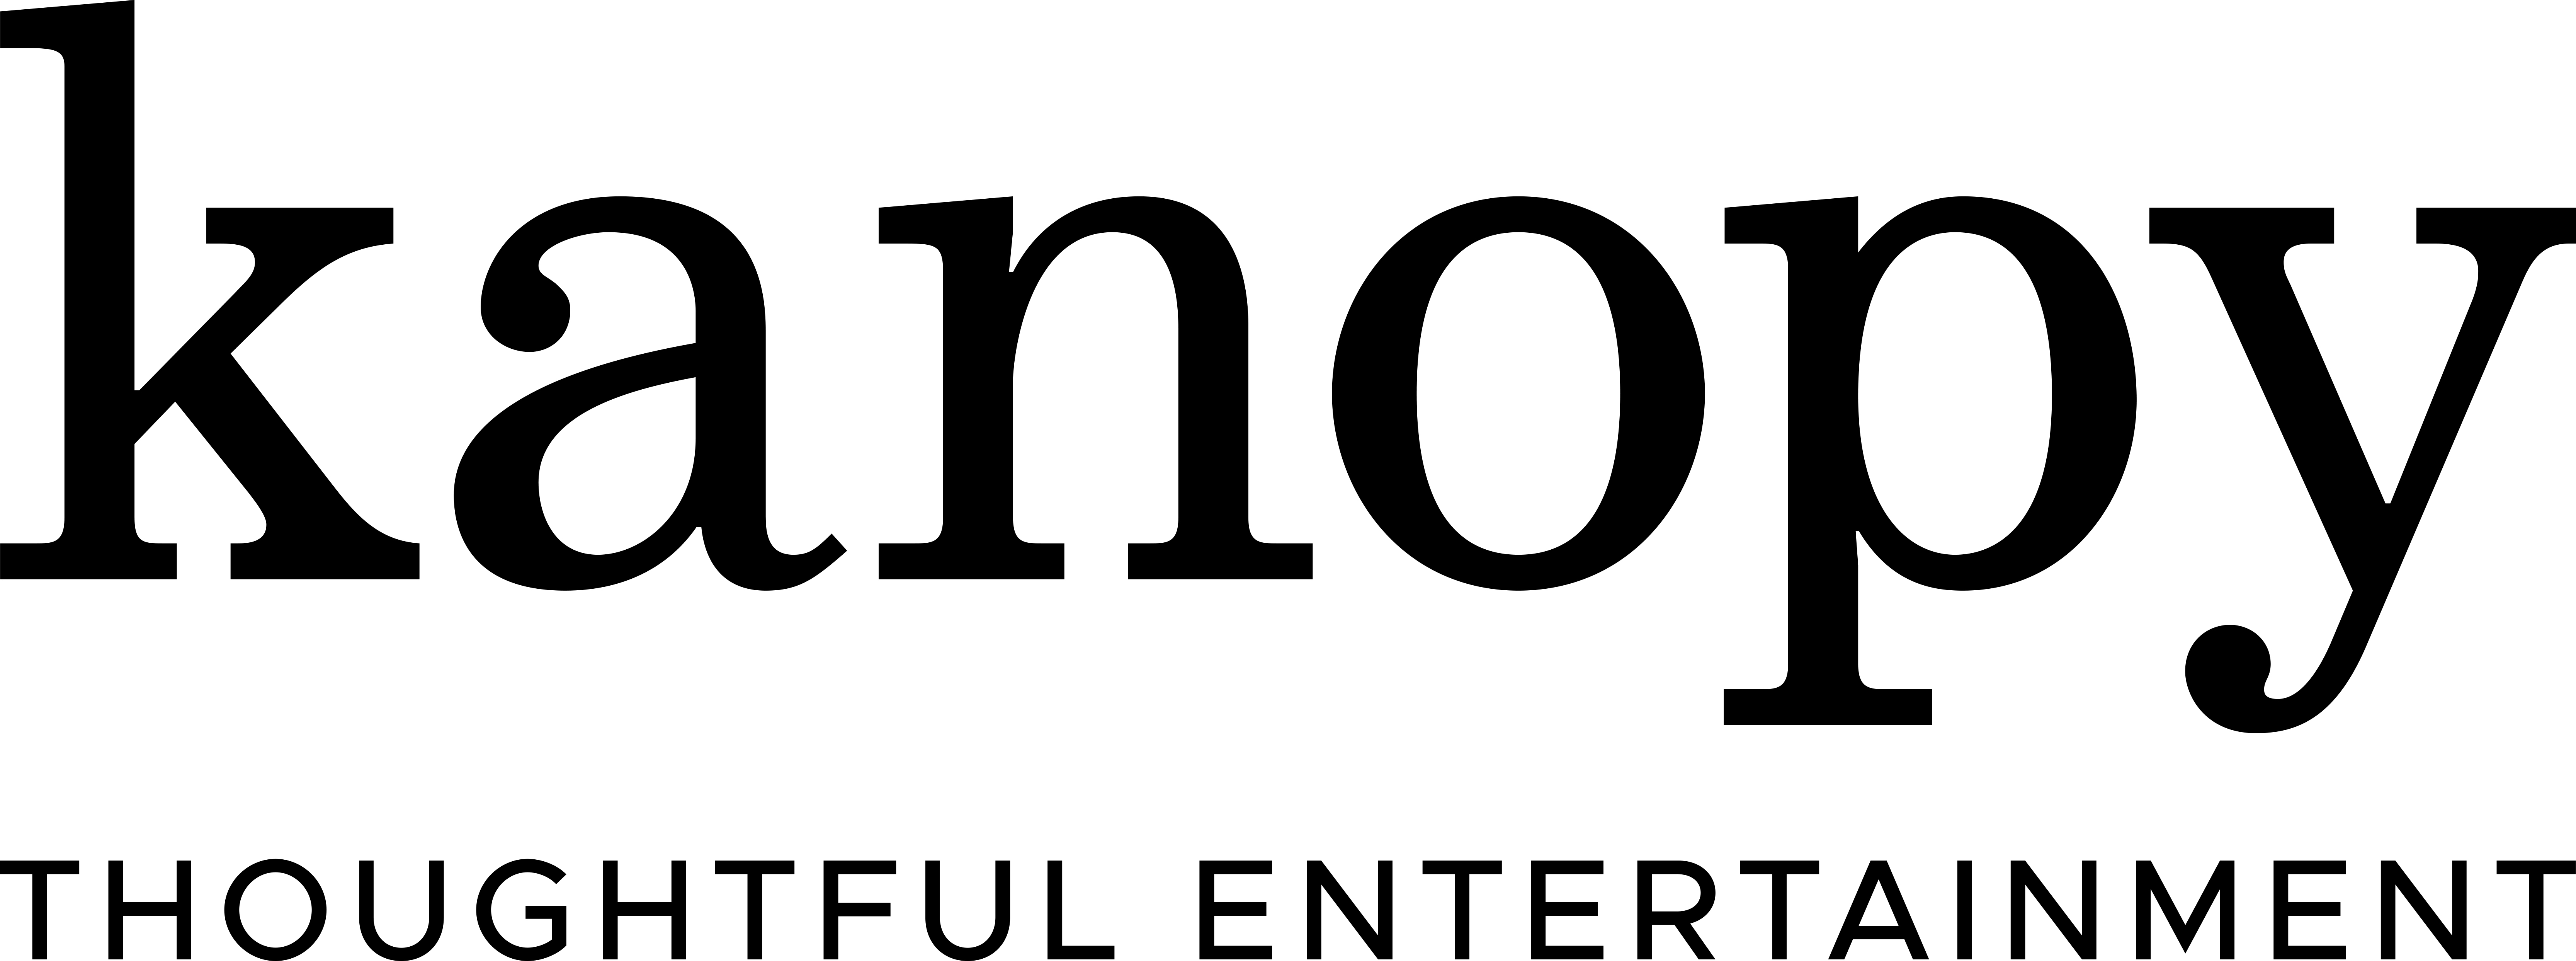 kanopy logo black with slogan.jpg